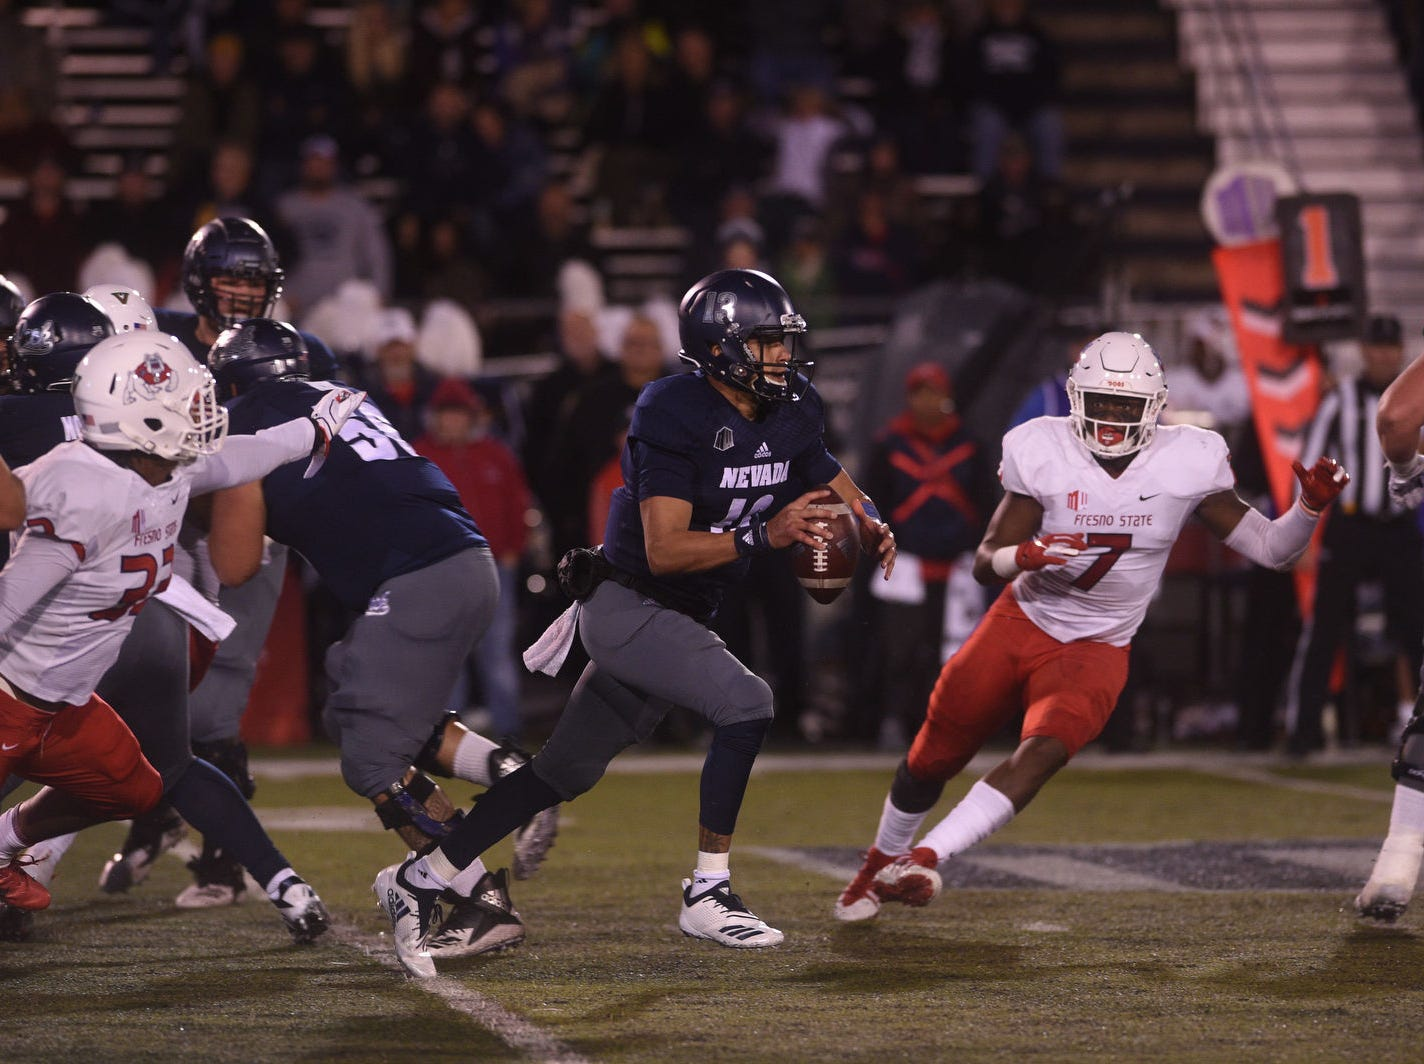 Nevada takes on Fresno St. during their football game at Mackay Stadium in Reno on Oct. 6, 2018.